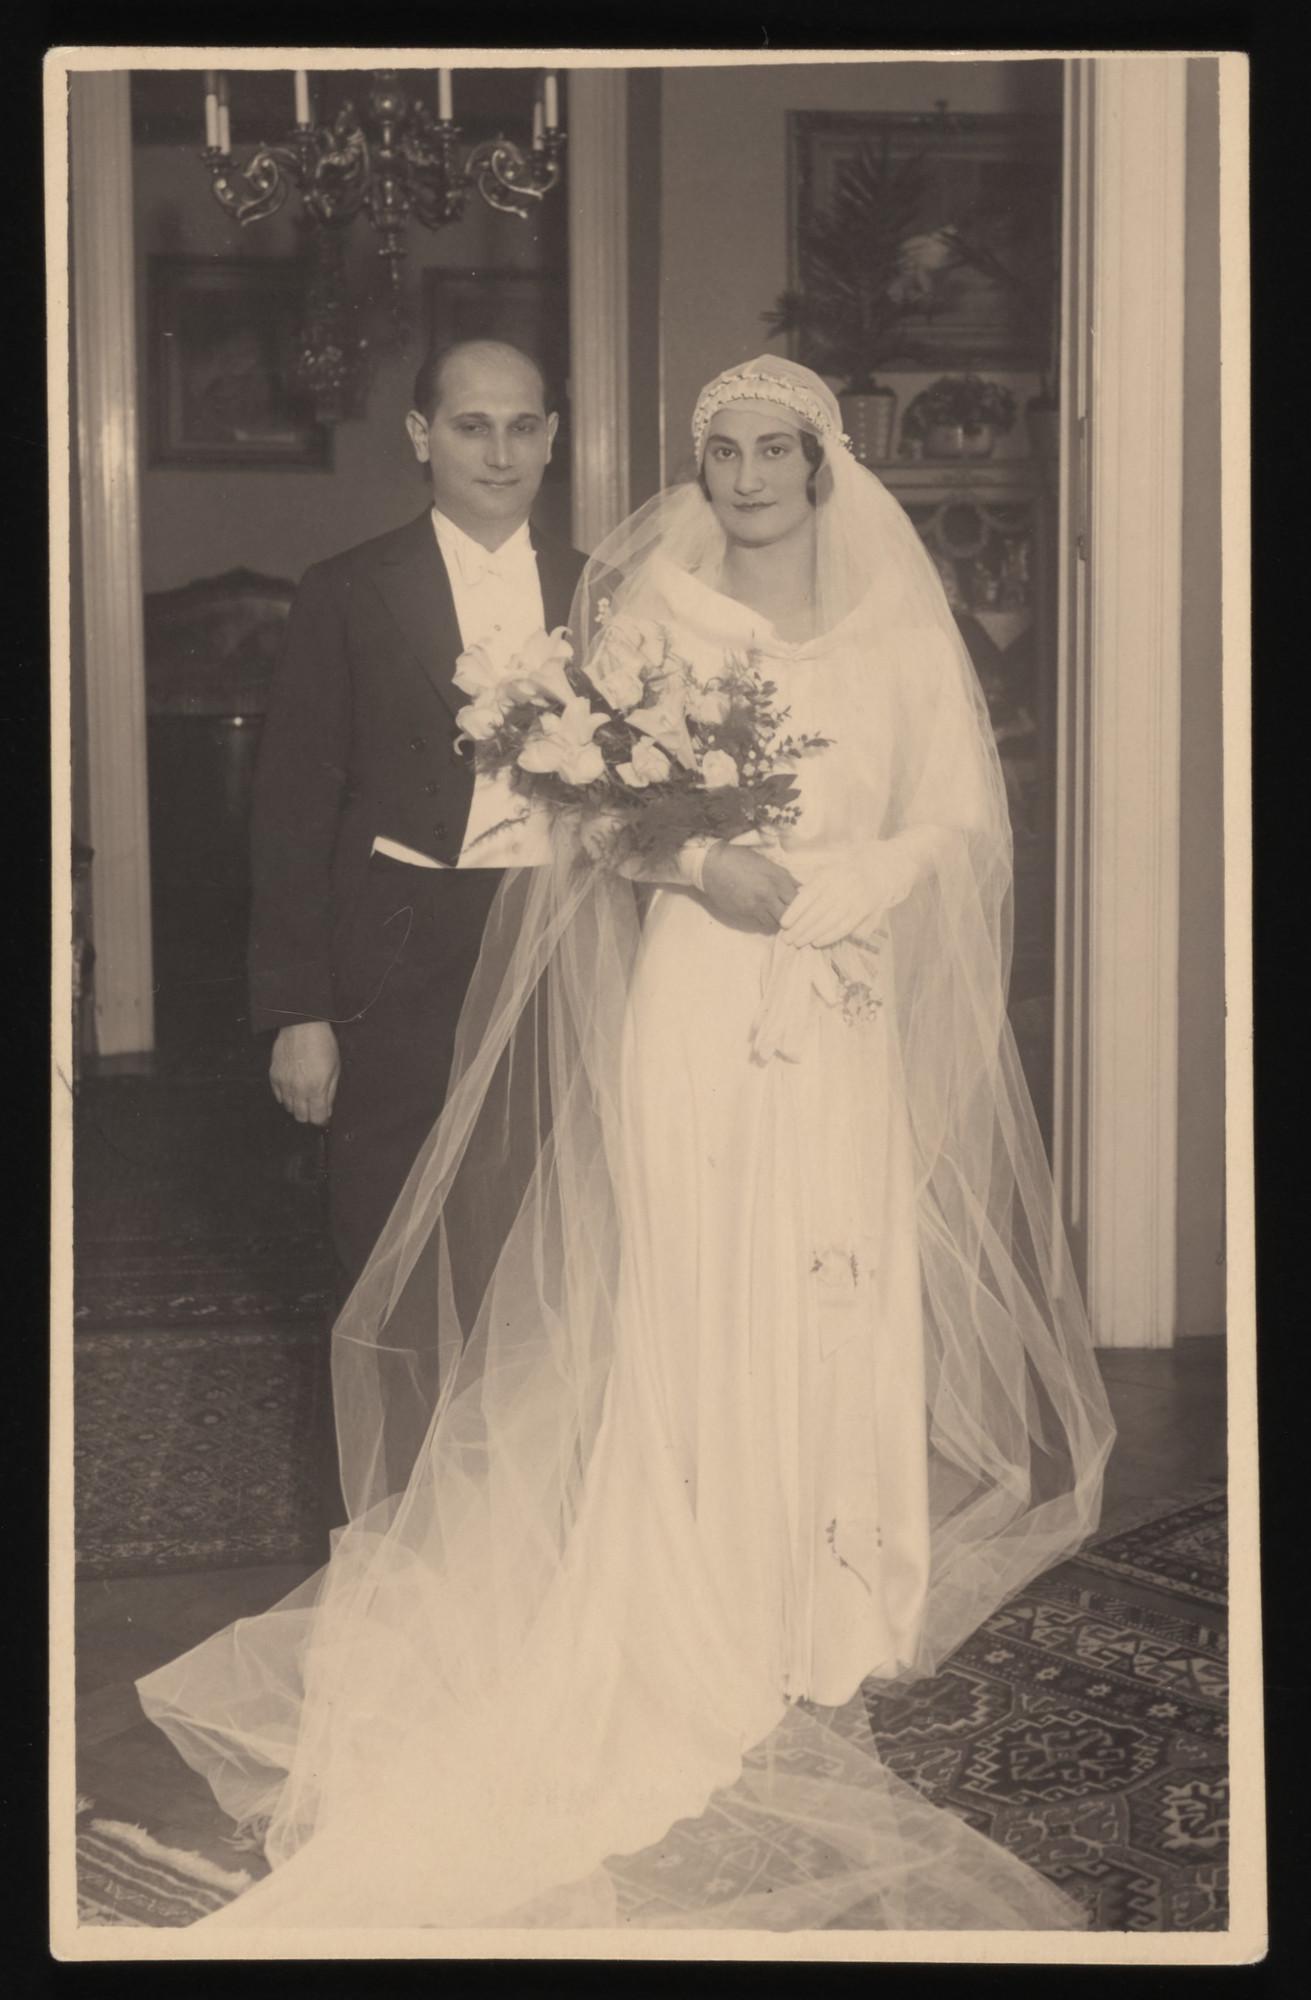 Wedding portrait of Elek Brust and Livia Schwarcz.